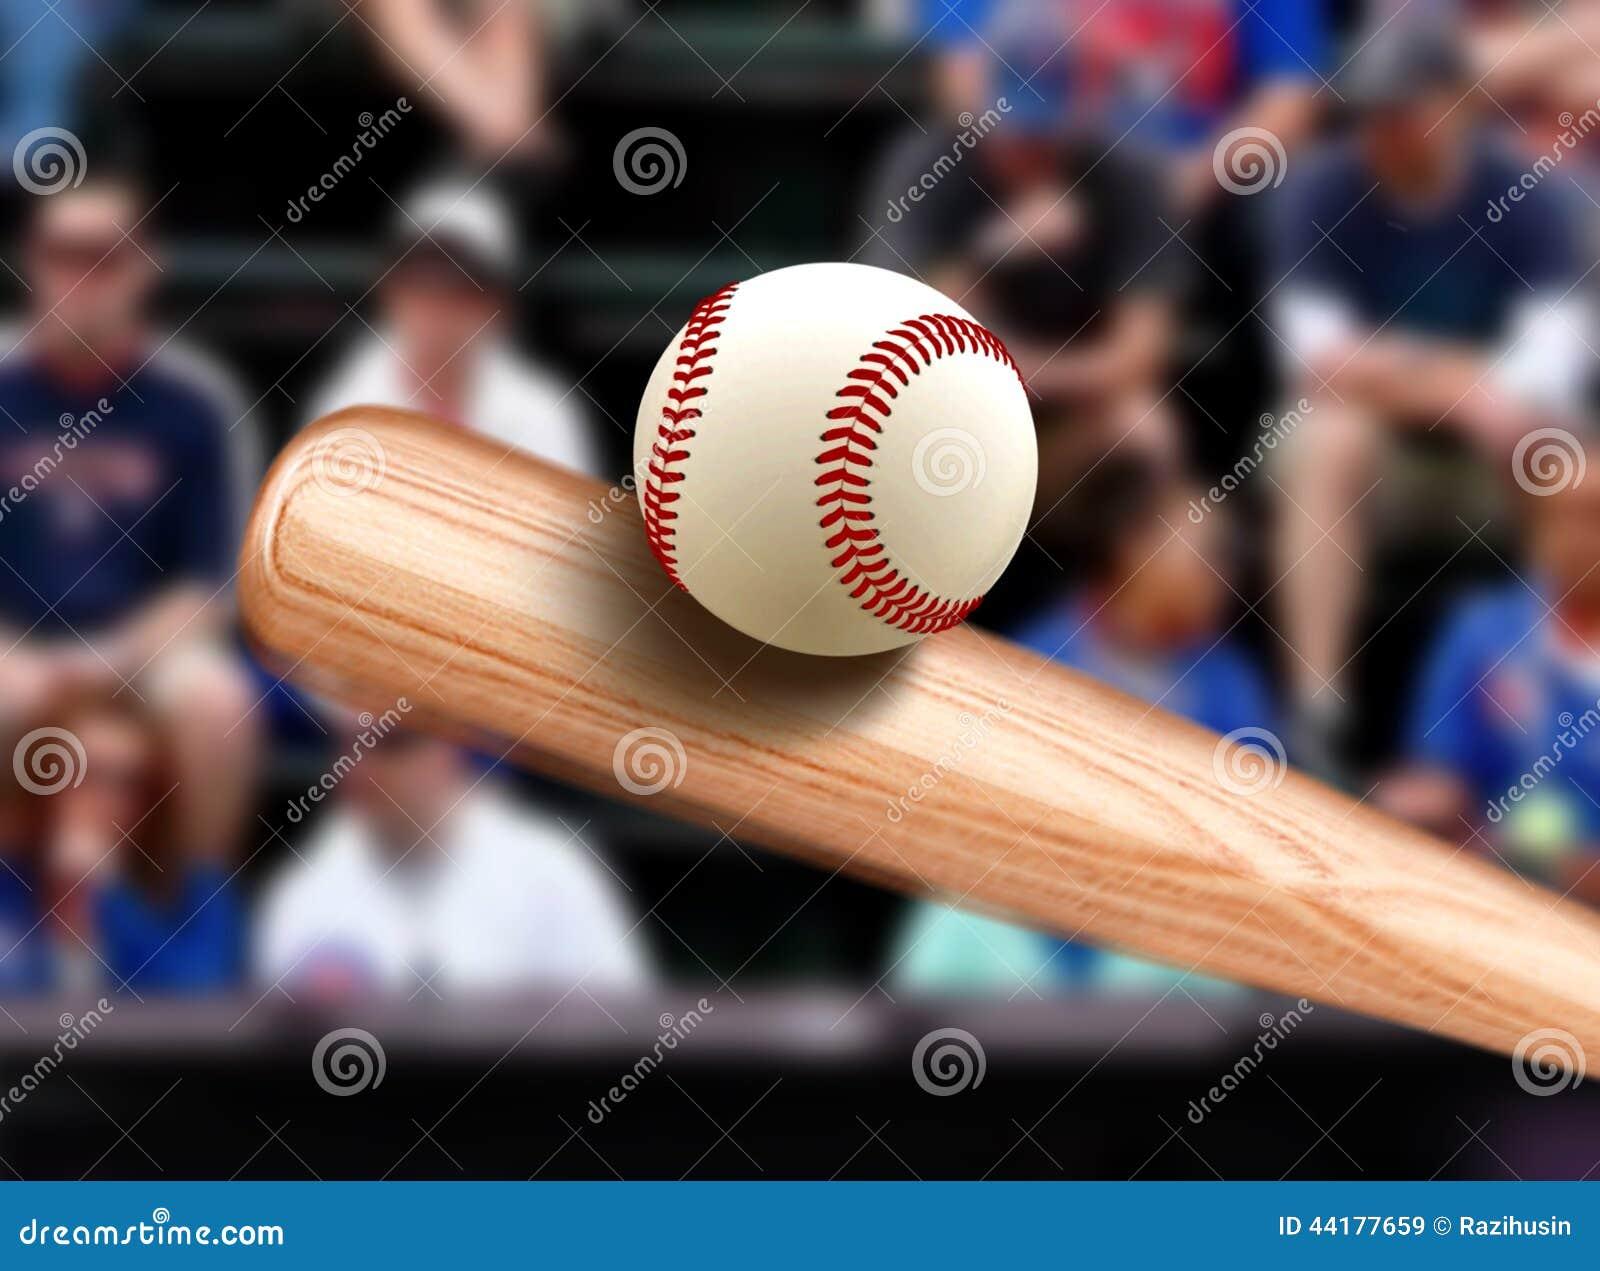 Baseball Bat Hitting Ball Stock Photo - Image: 44177659